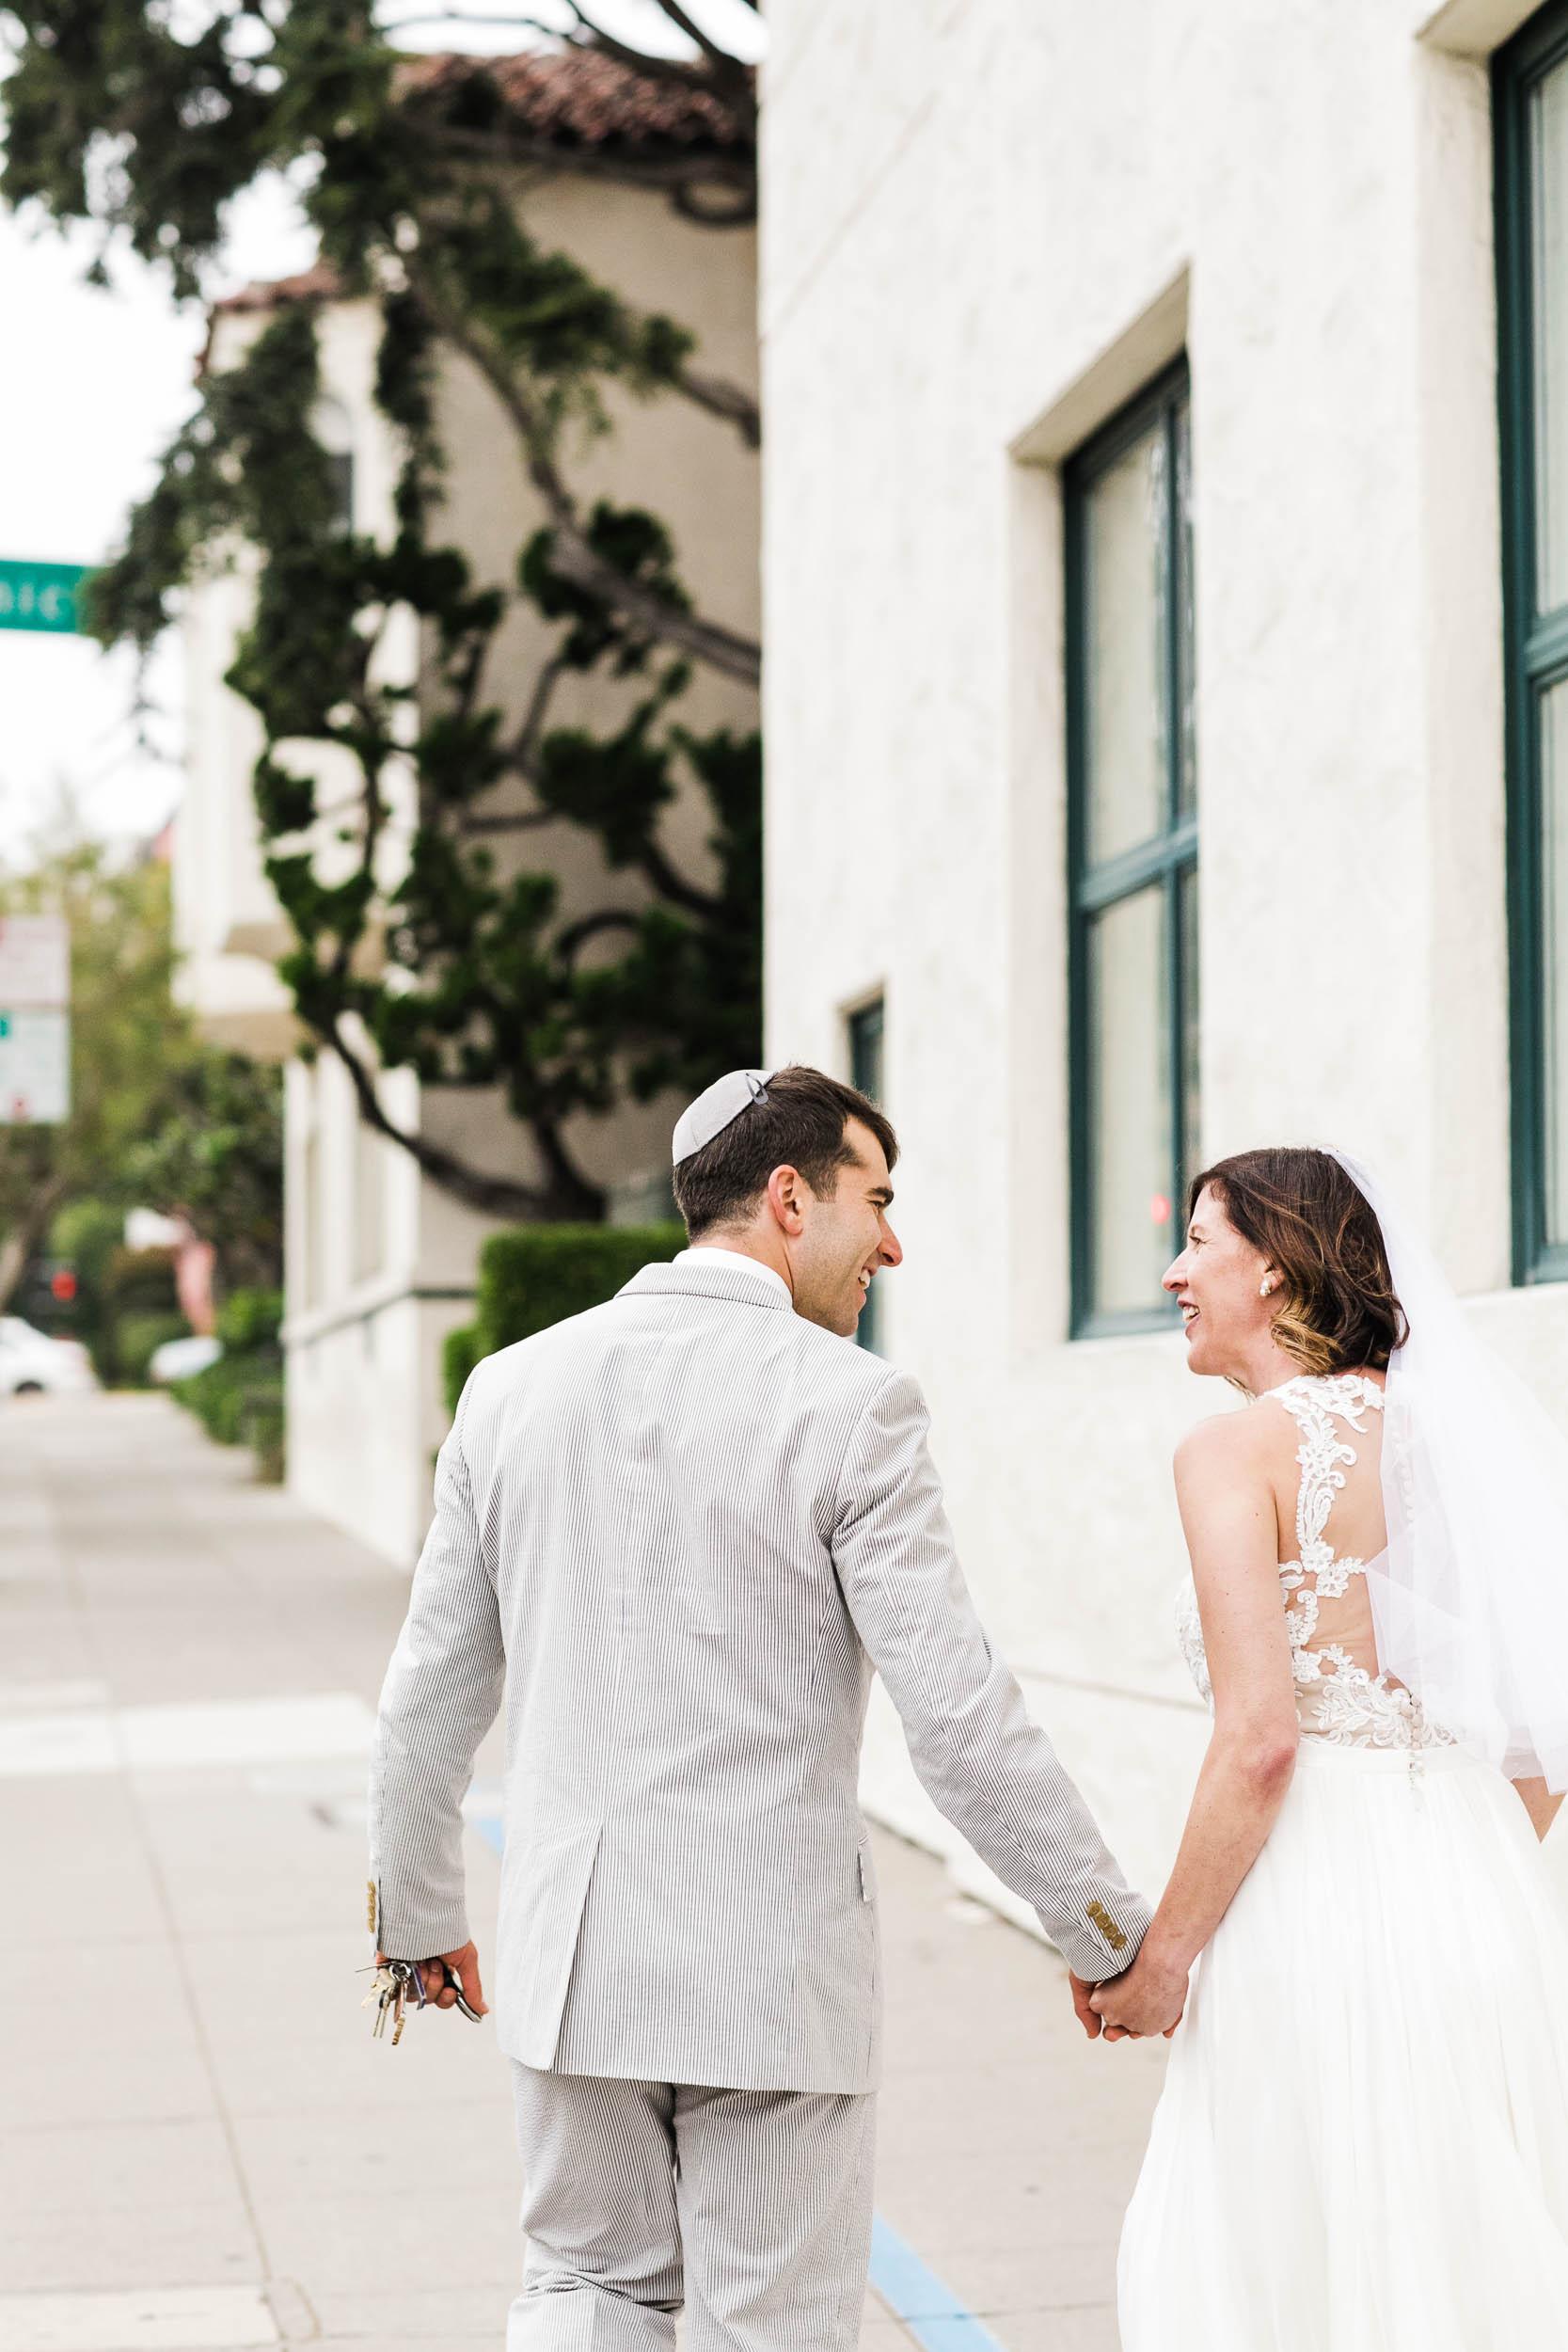 081818_Alina Jason San Francisco Wedding_Buena Lane Photography_1823.jpg